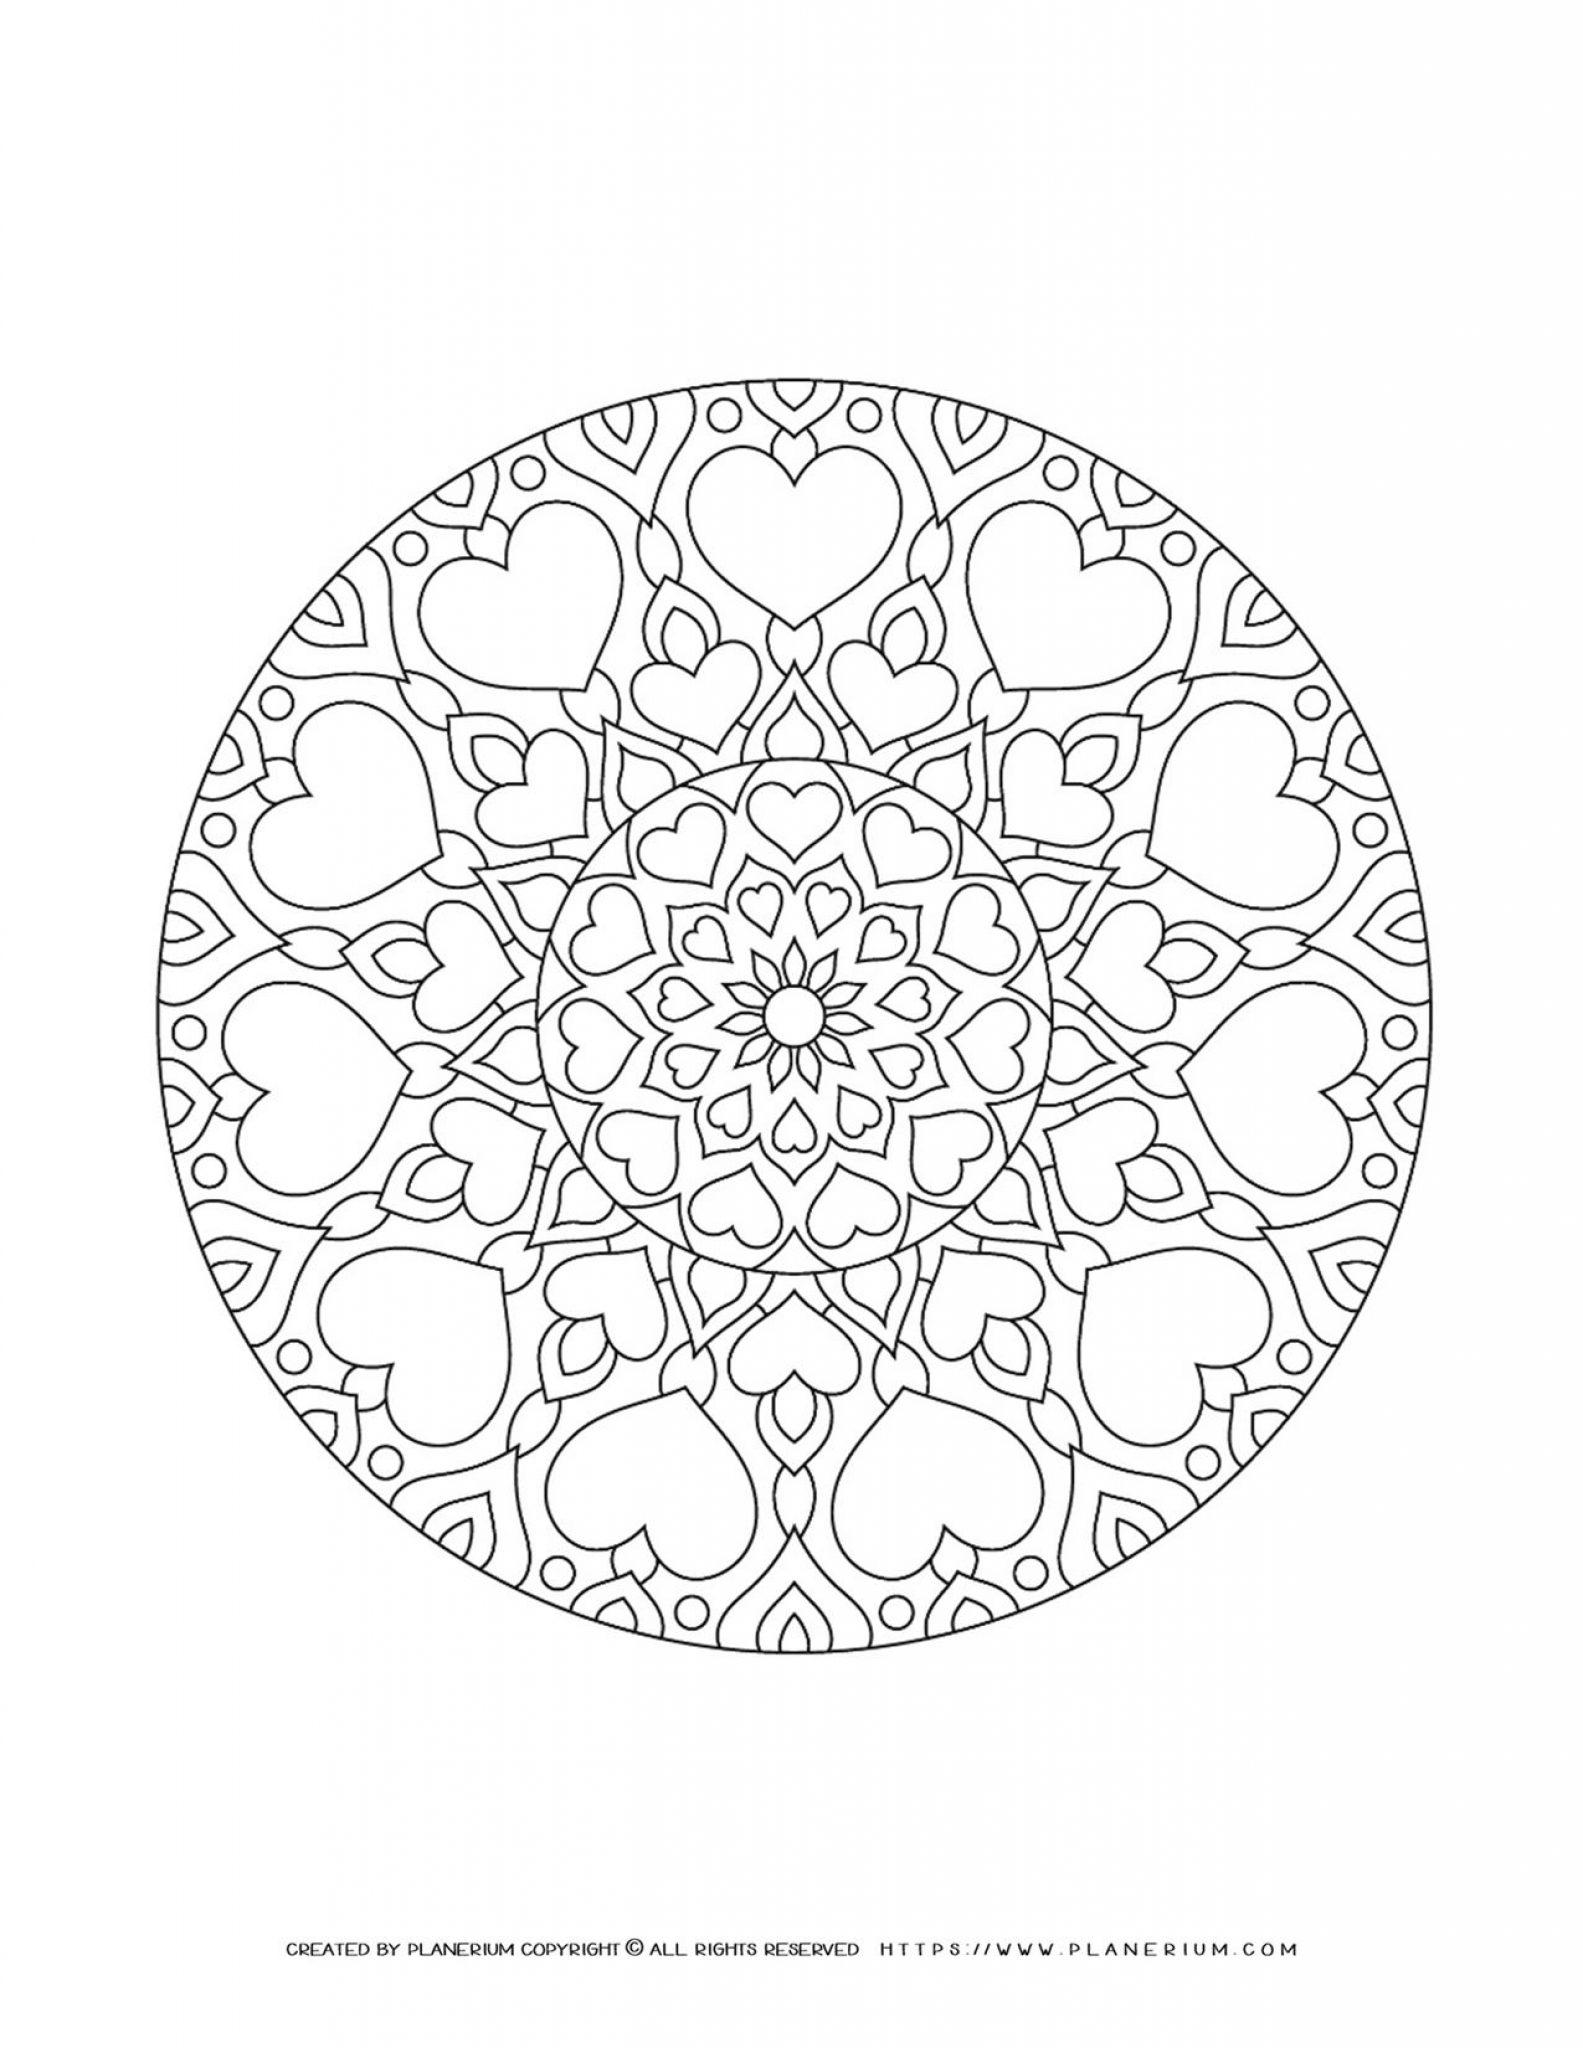 Valentines Day - Coloring Page - Hearts Mandala Closed Circle | Planerium